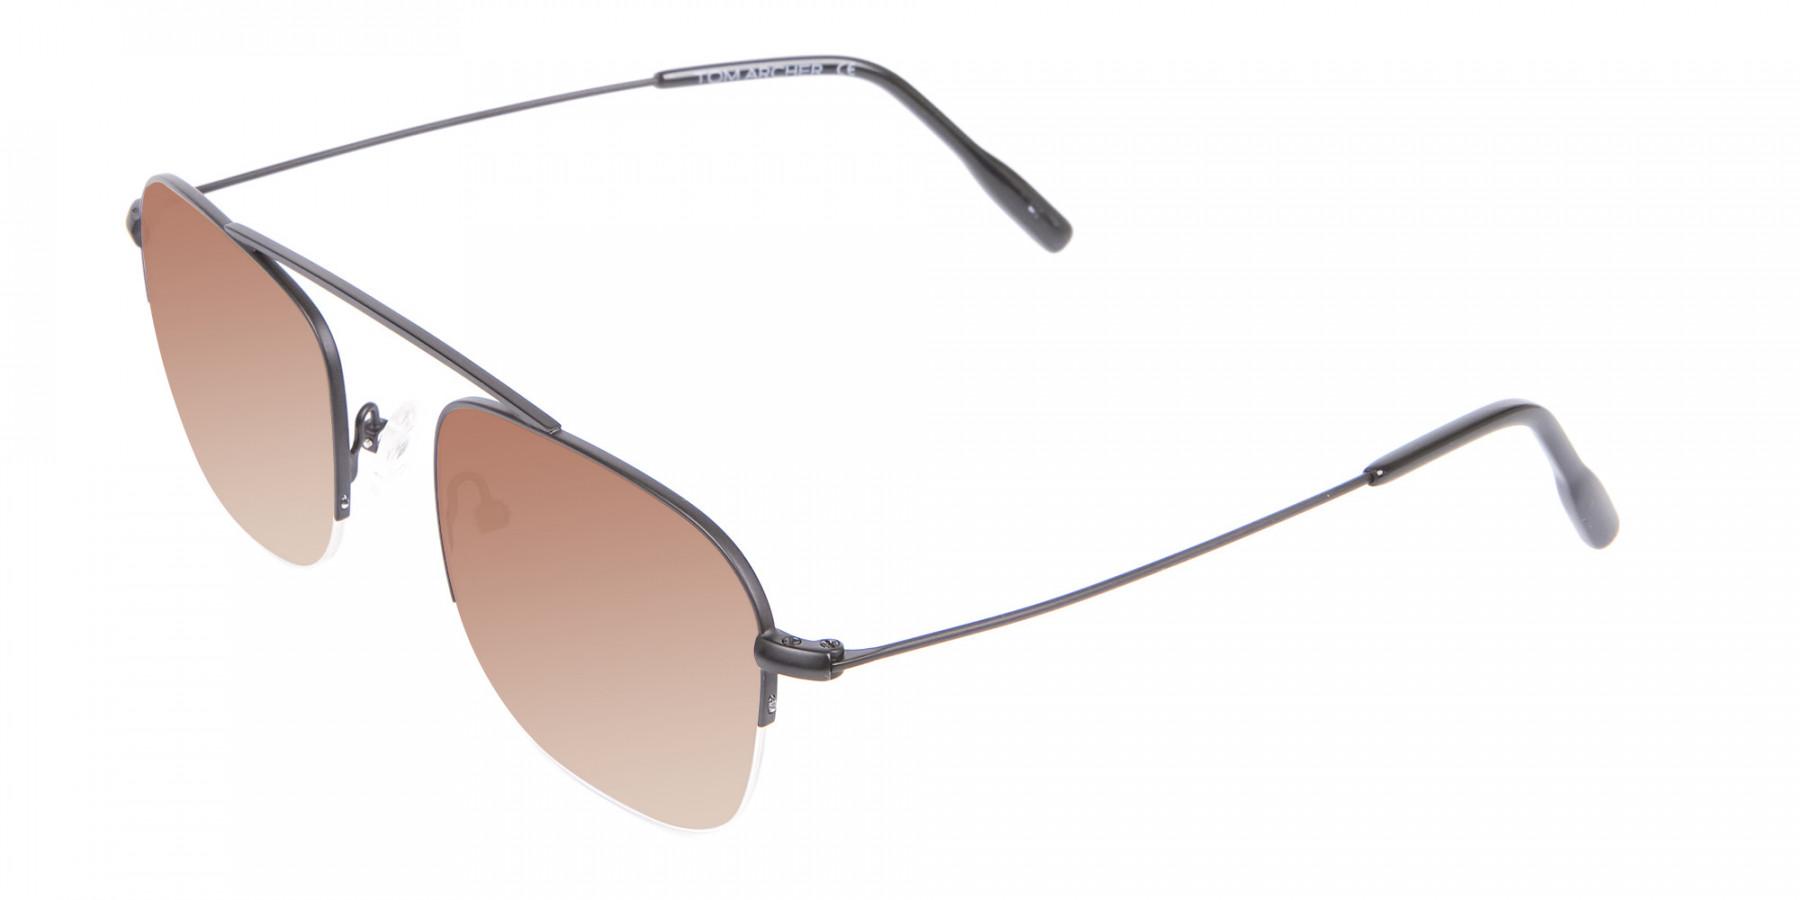 Black Square Sunglasses - 3